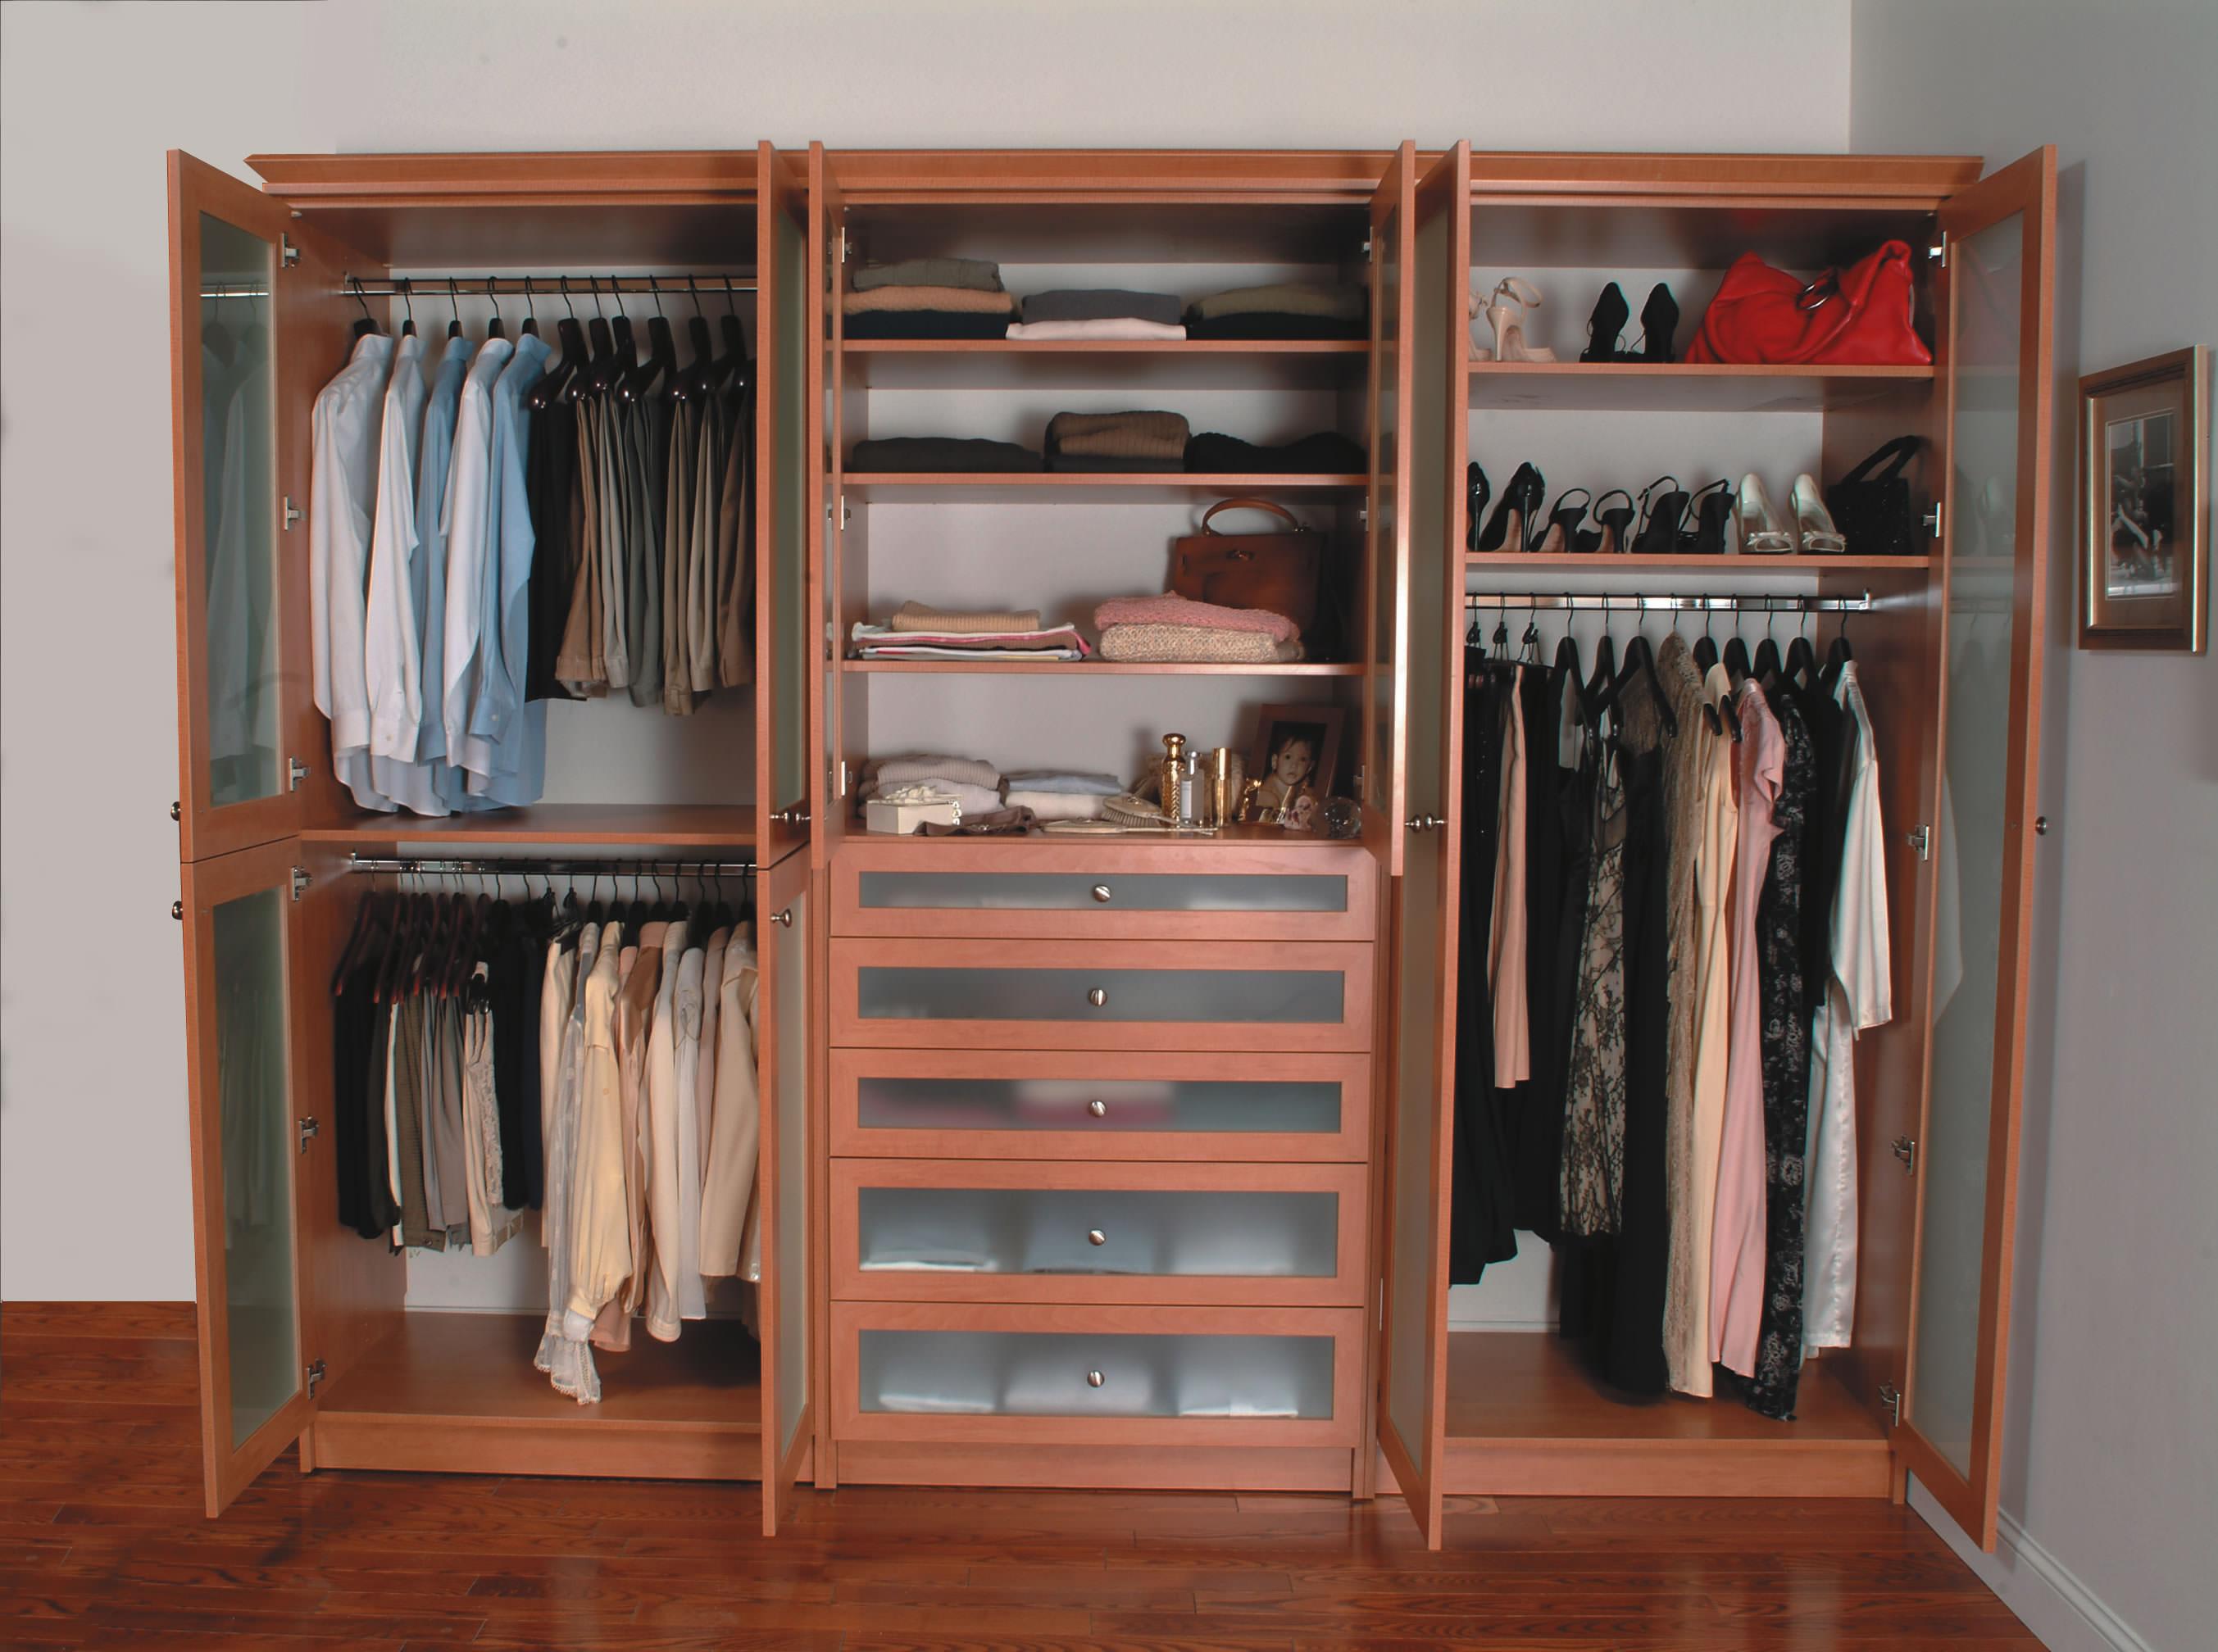 bedroom closets custom-built-reach-in-closets2018-10-11 at 2.41. BKNAVUX